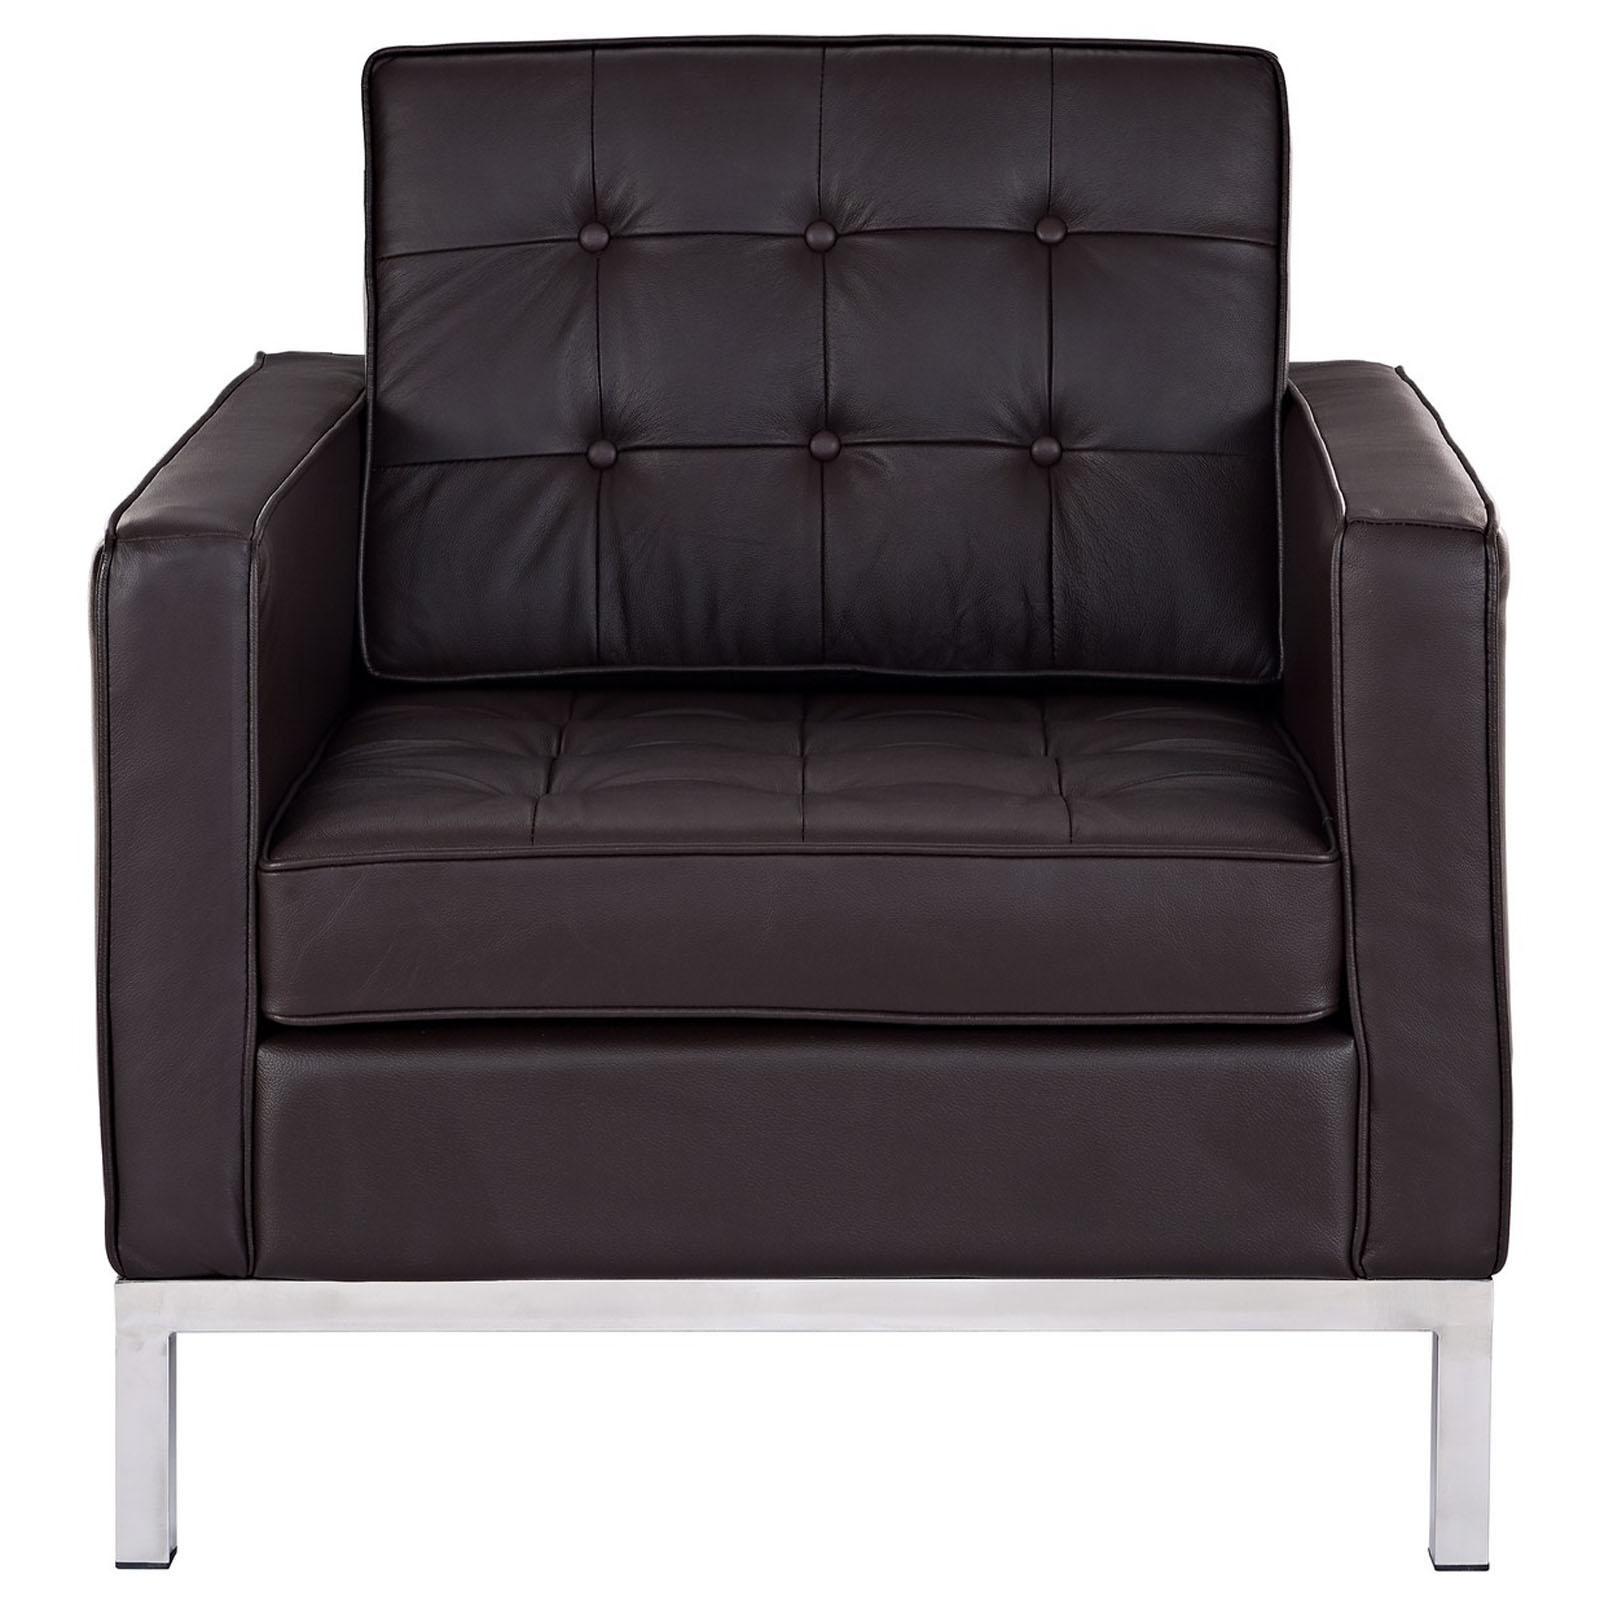 florence-chair-in-brown.jpg